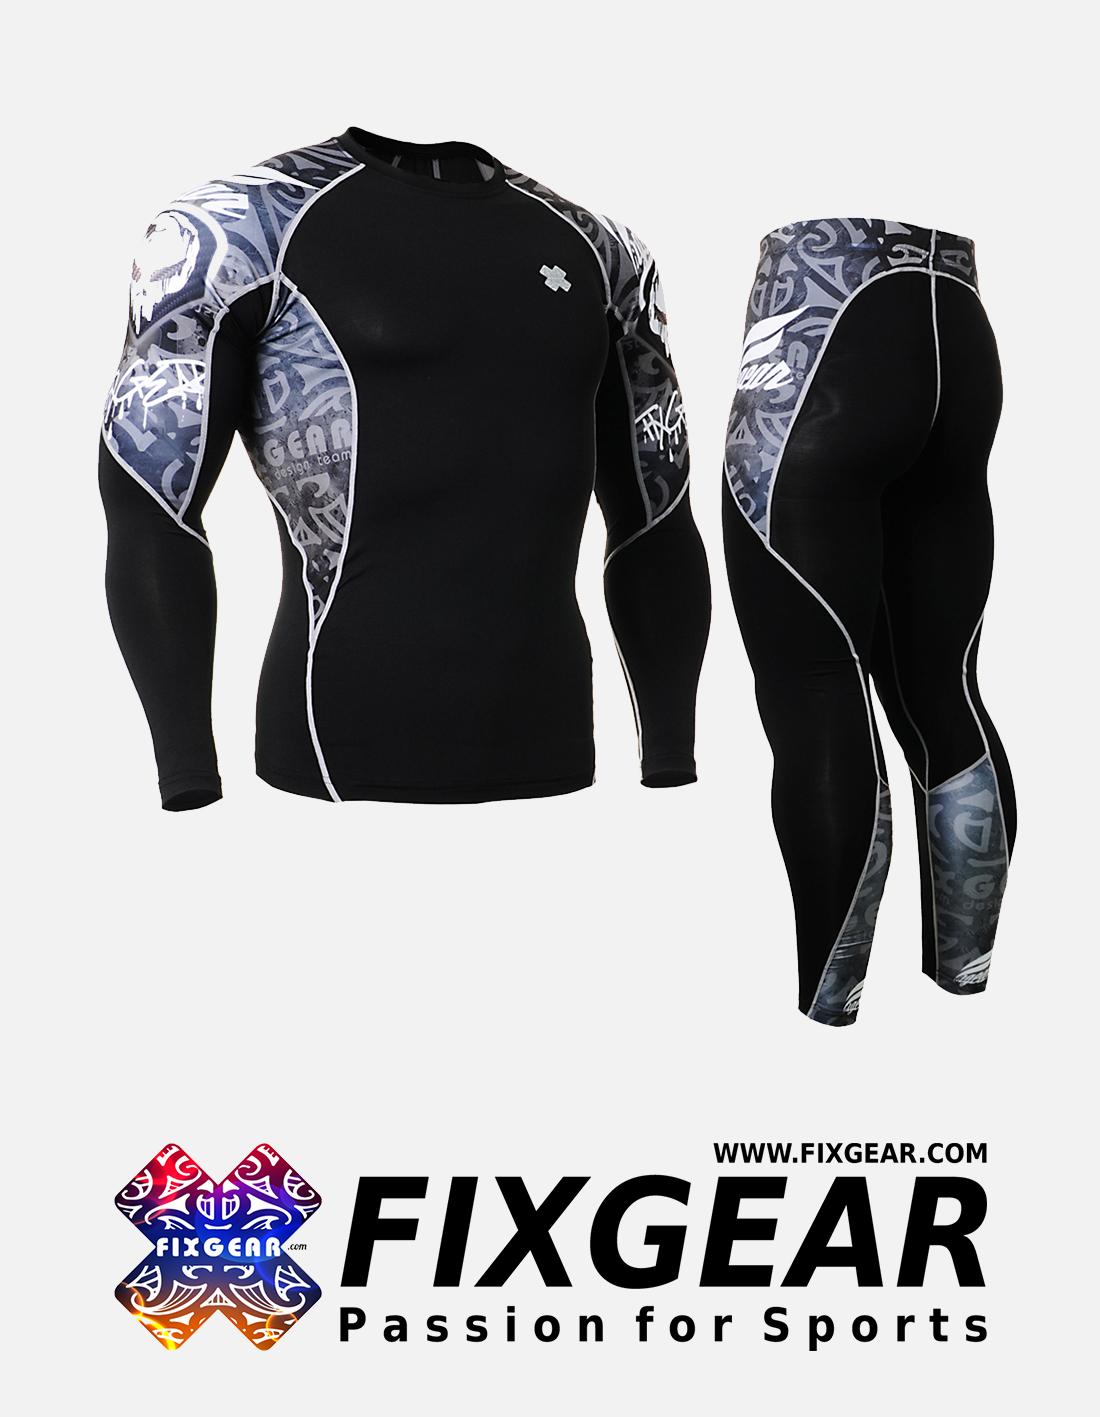 FIXGEAR C2L-P2L-B43 Set Compression Base Layer Shirt & Legging Pants